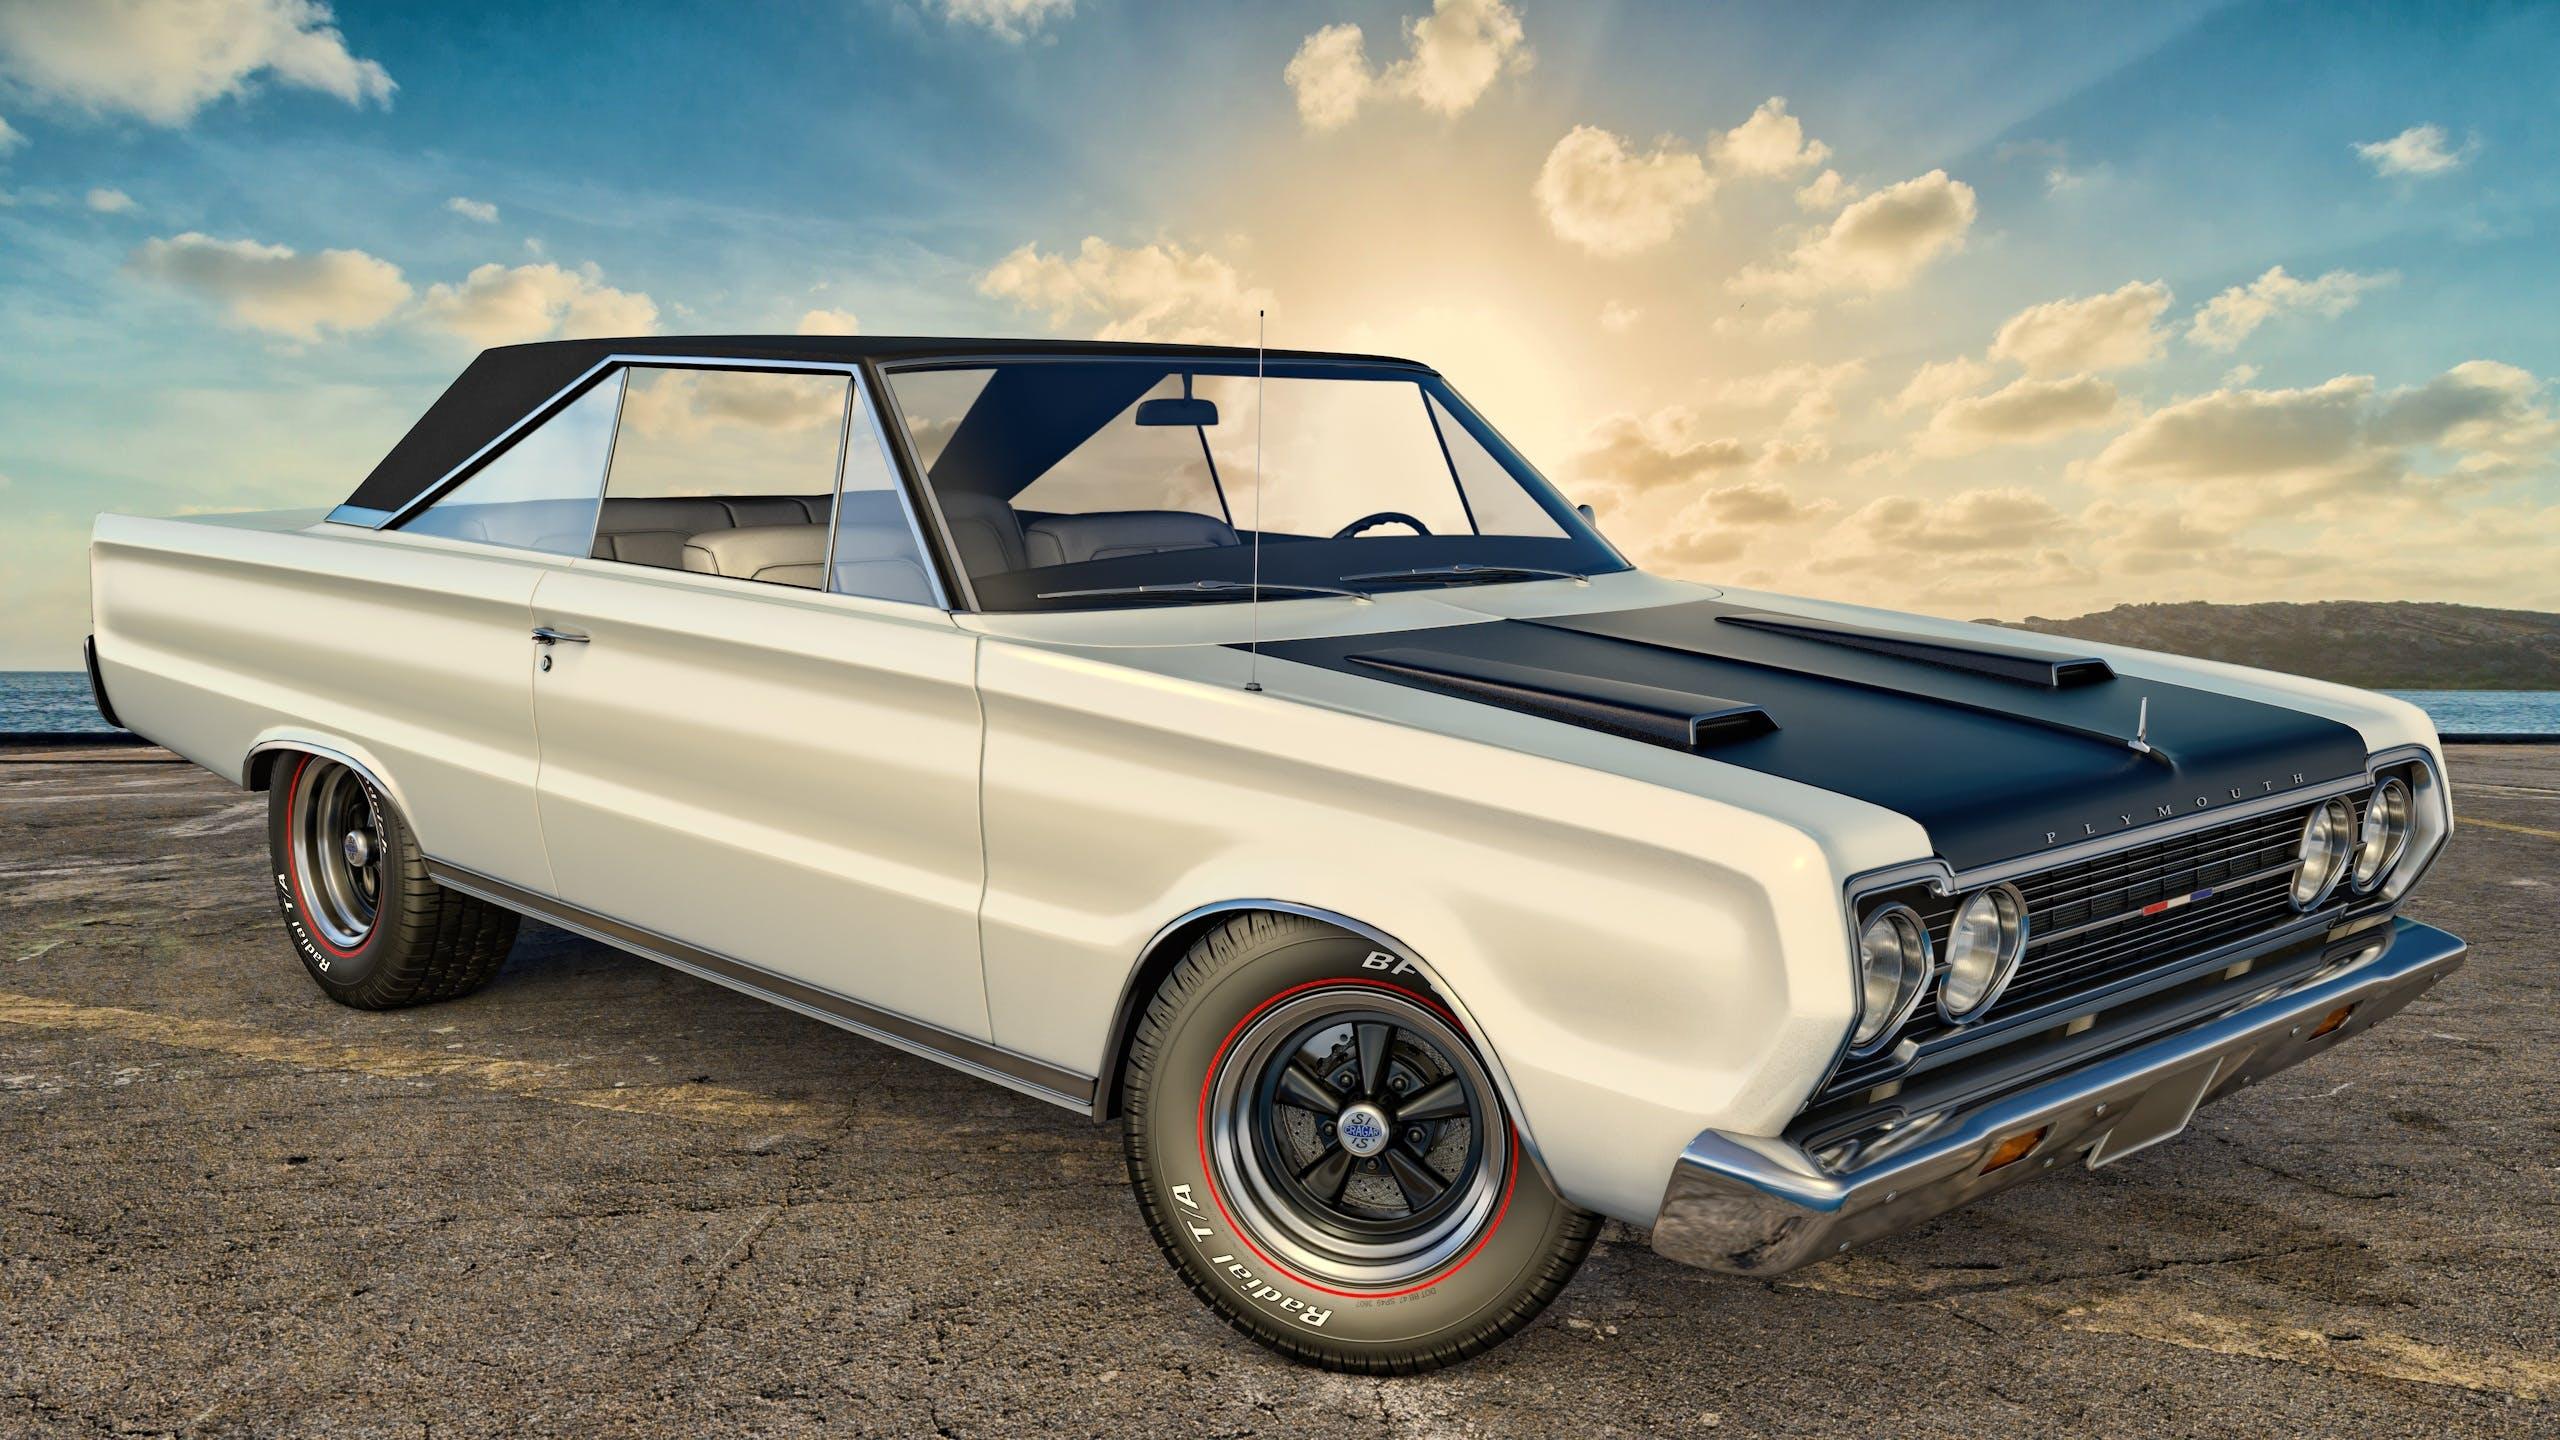 1967, 3d, america